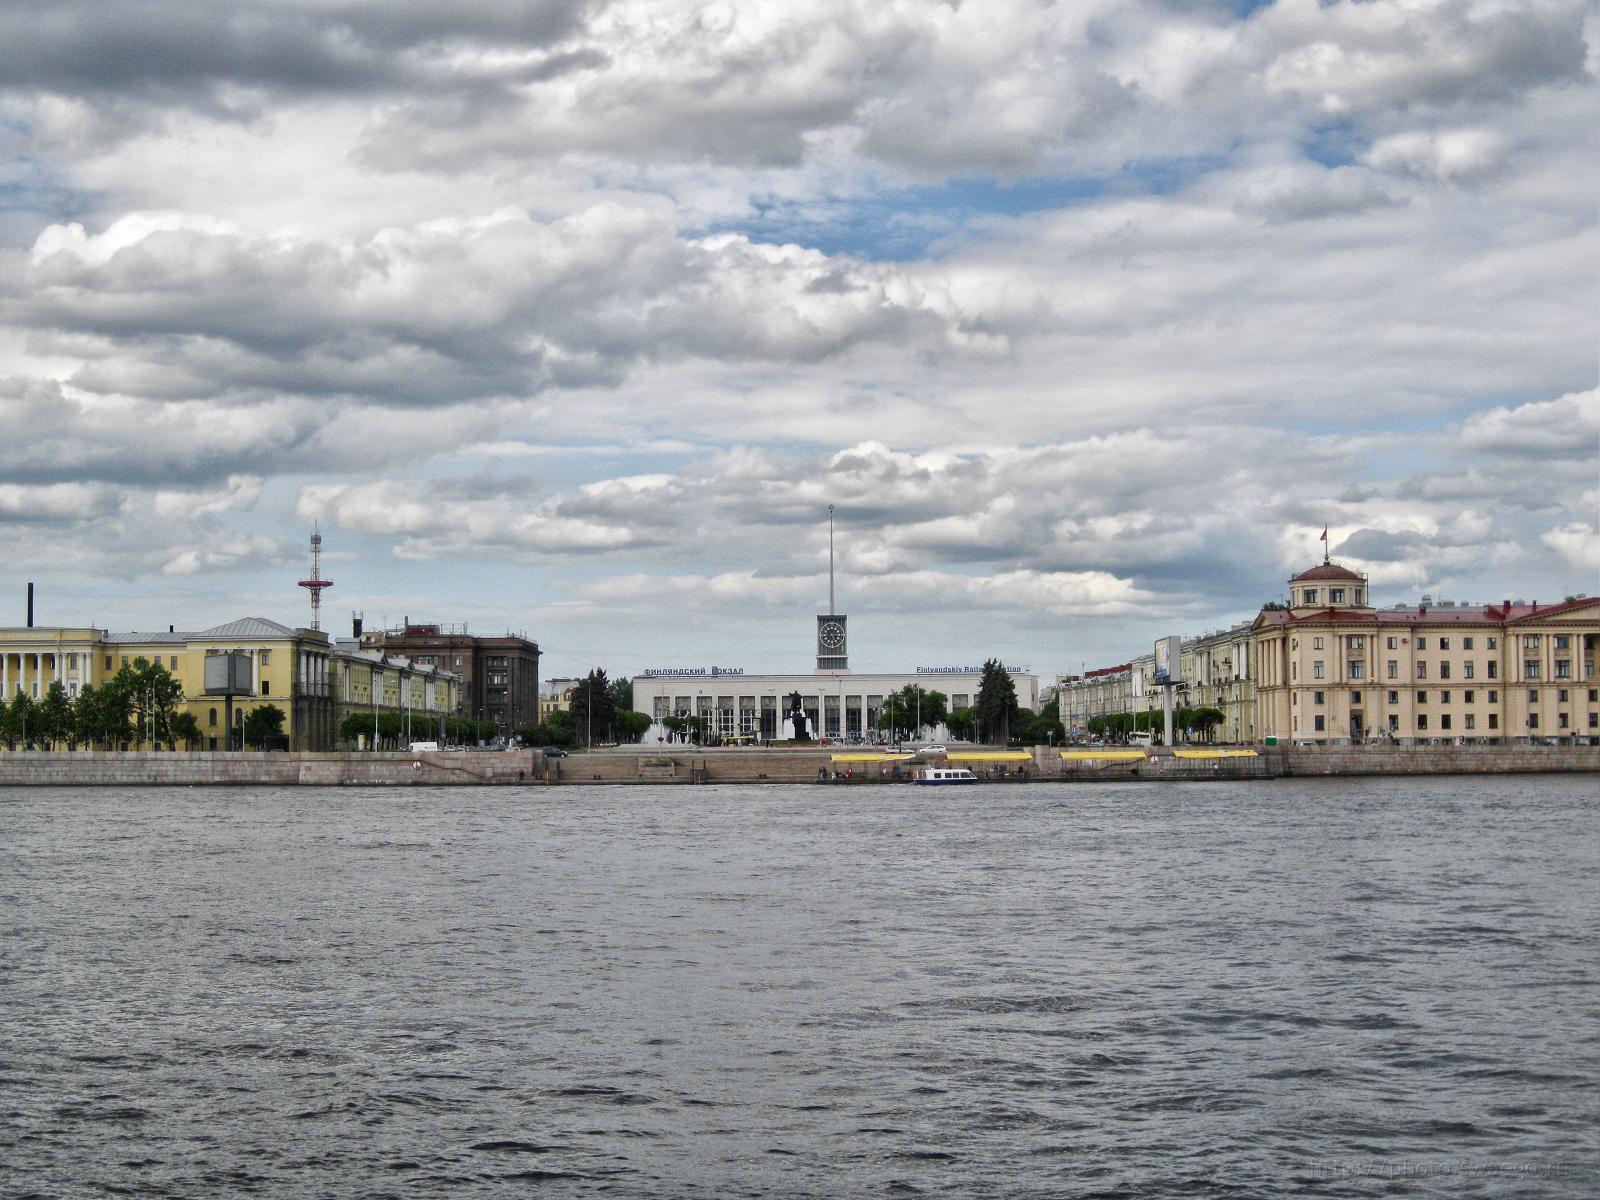 У Финляндского вокзала